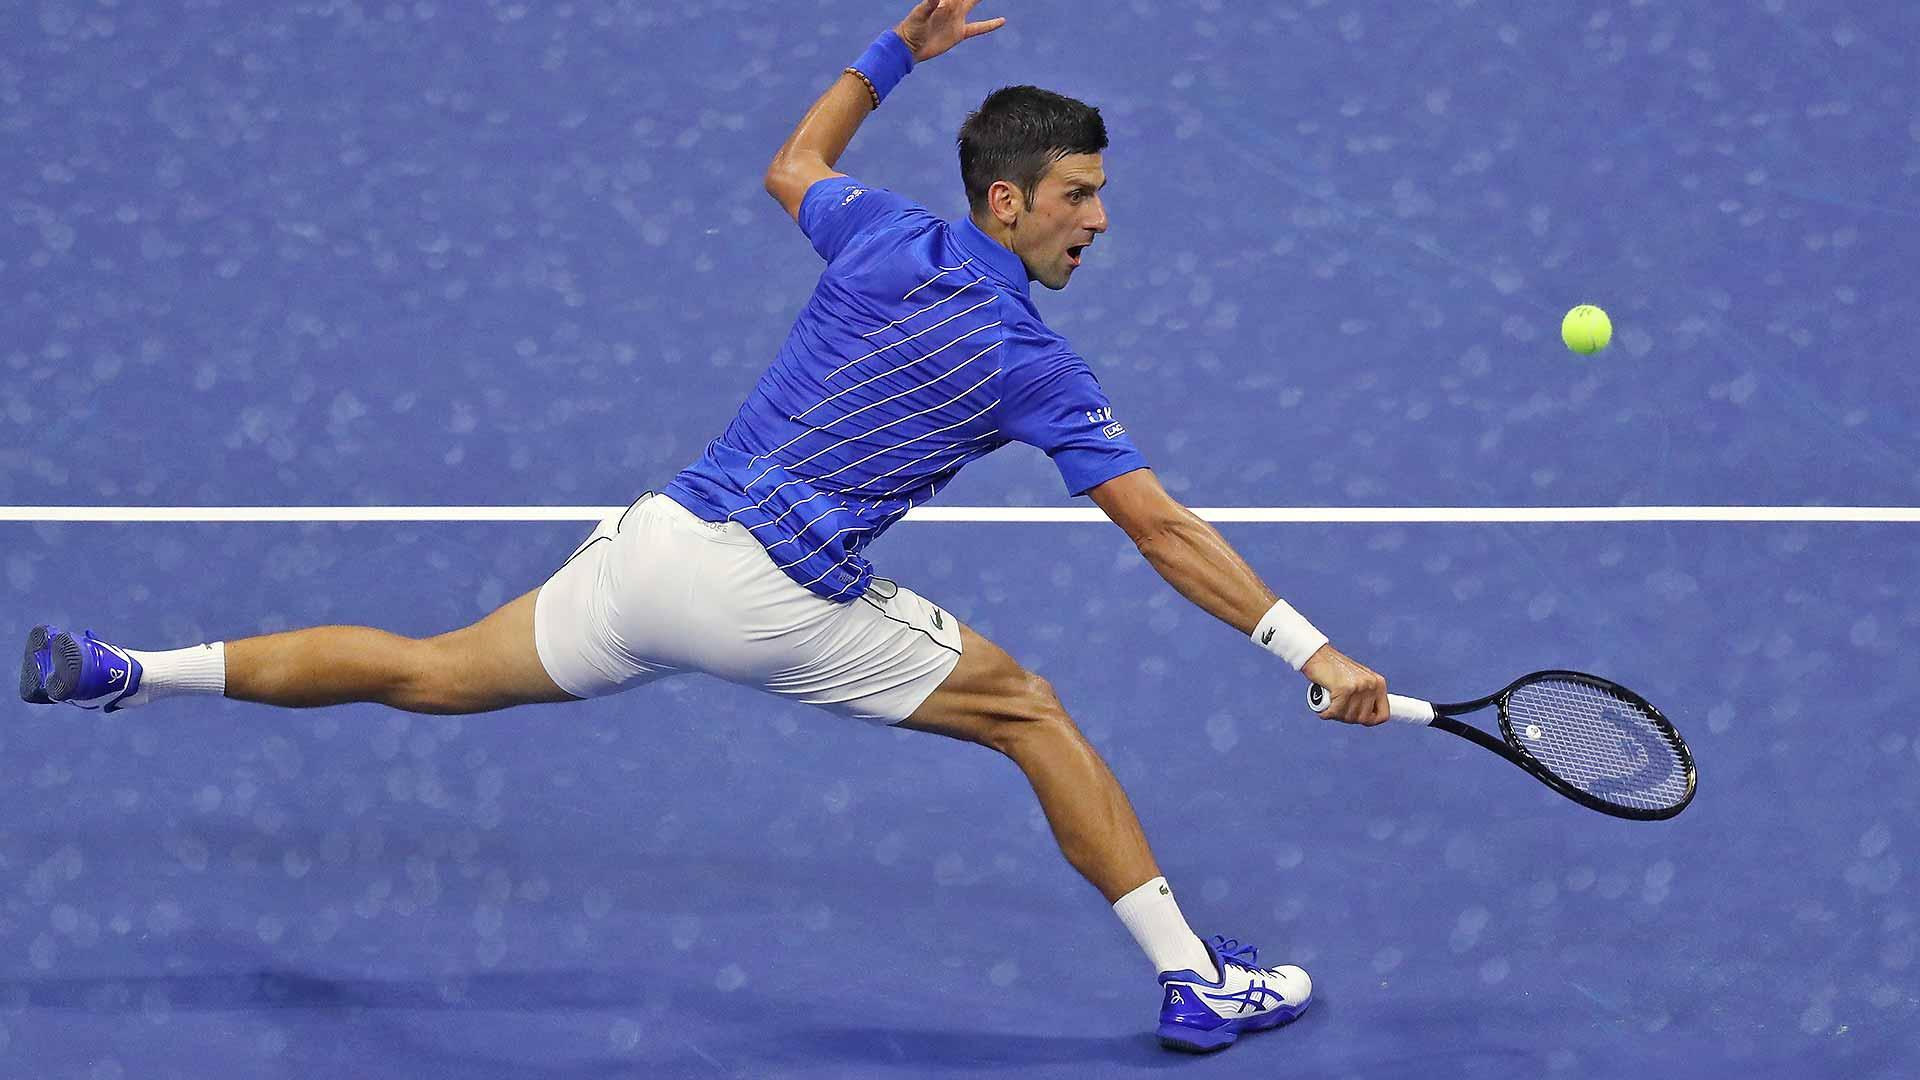 Us Open 2020 Novak Djokovic Sails Past Damir Dzumhur Atp Tour Tennis